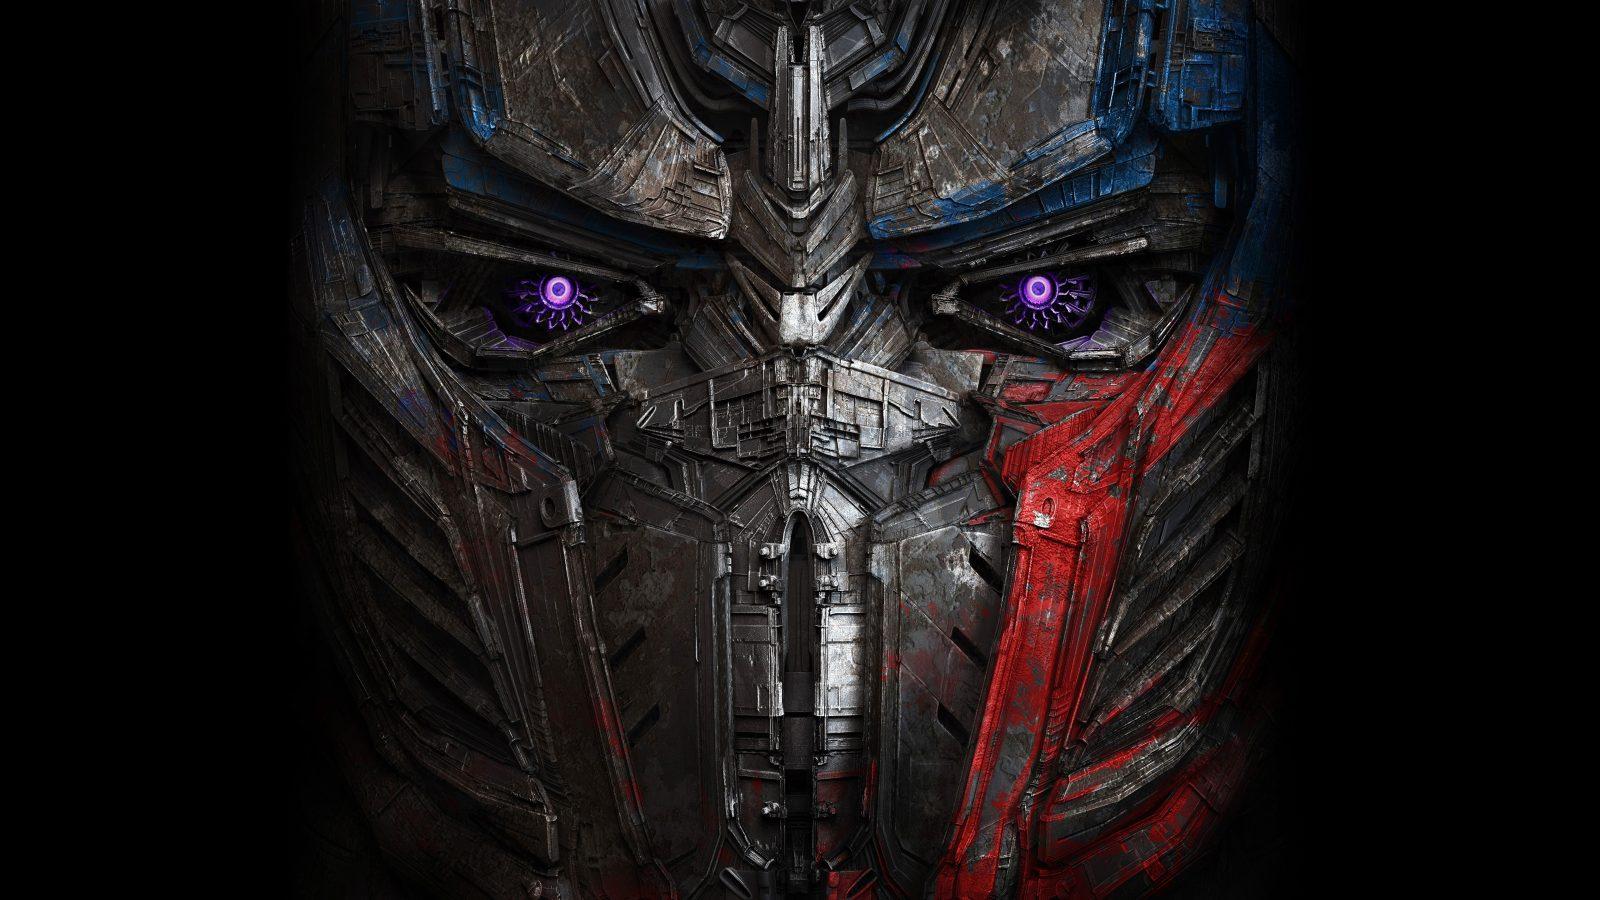 Transformers The Last Knight Wallpaper 4k 8k Hd Wallpaper Background